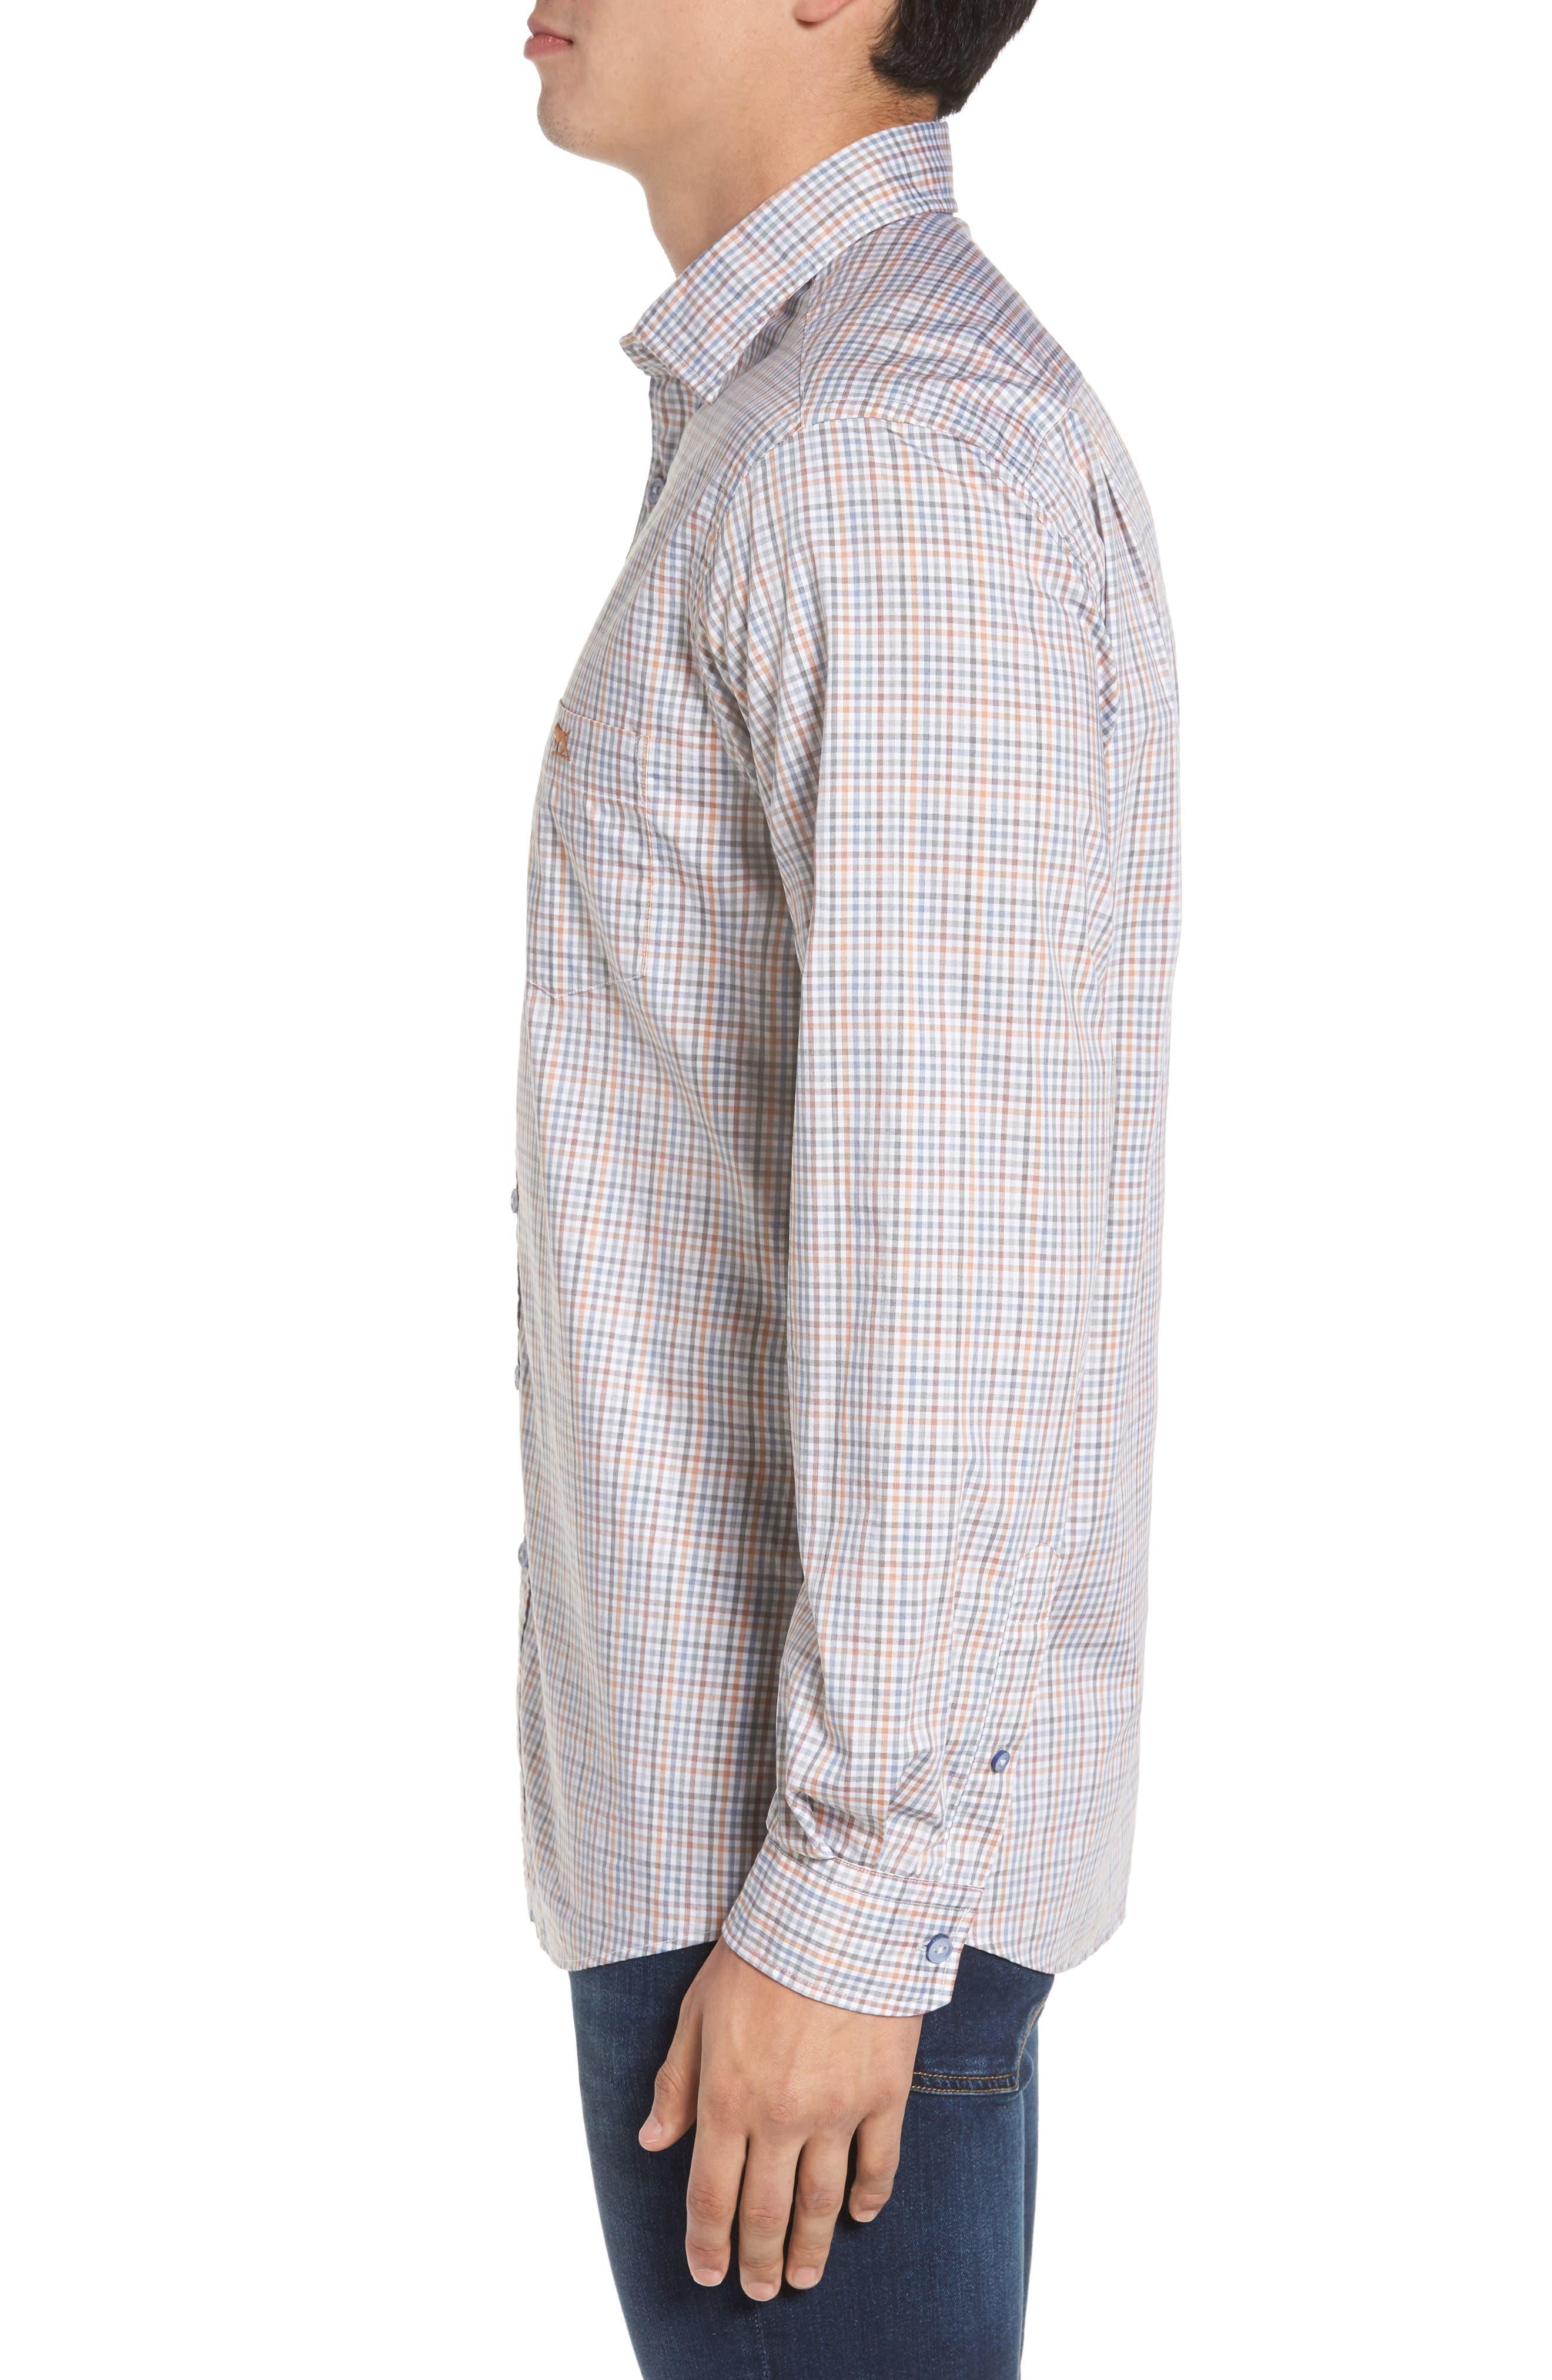 Woodlaw Original Fit Check Sport Shirt,                             Alternate thumbnail 5, color,